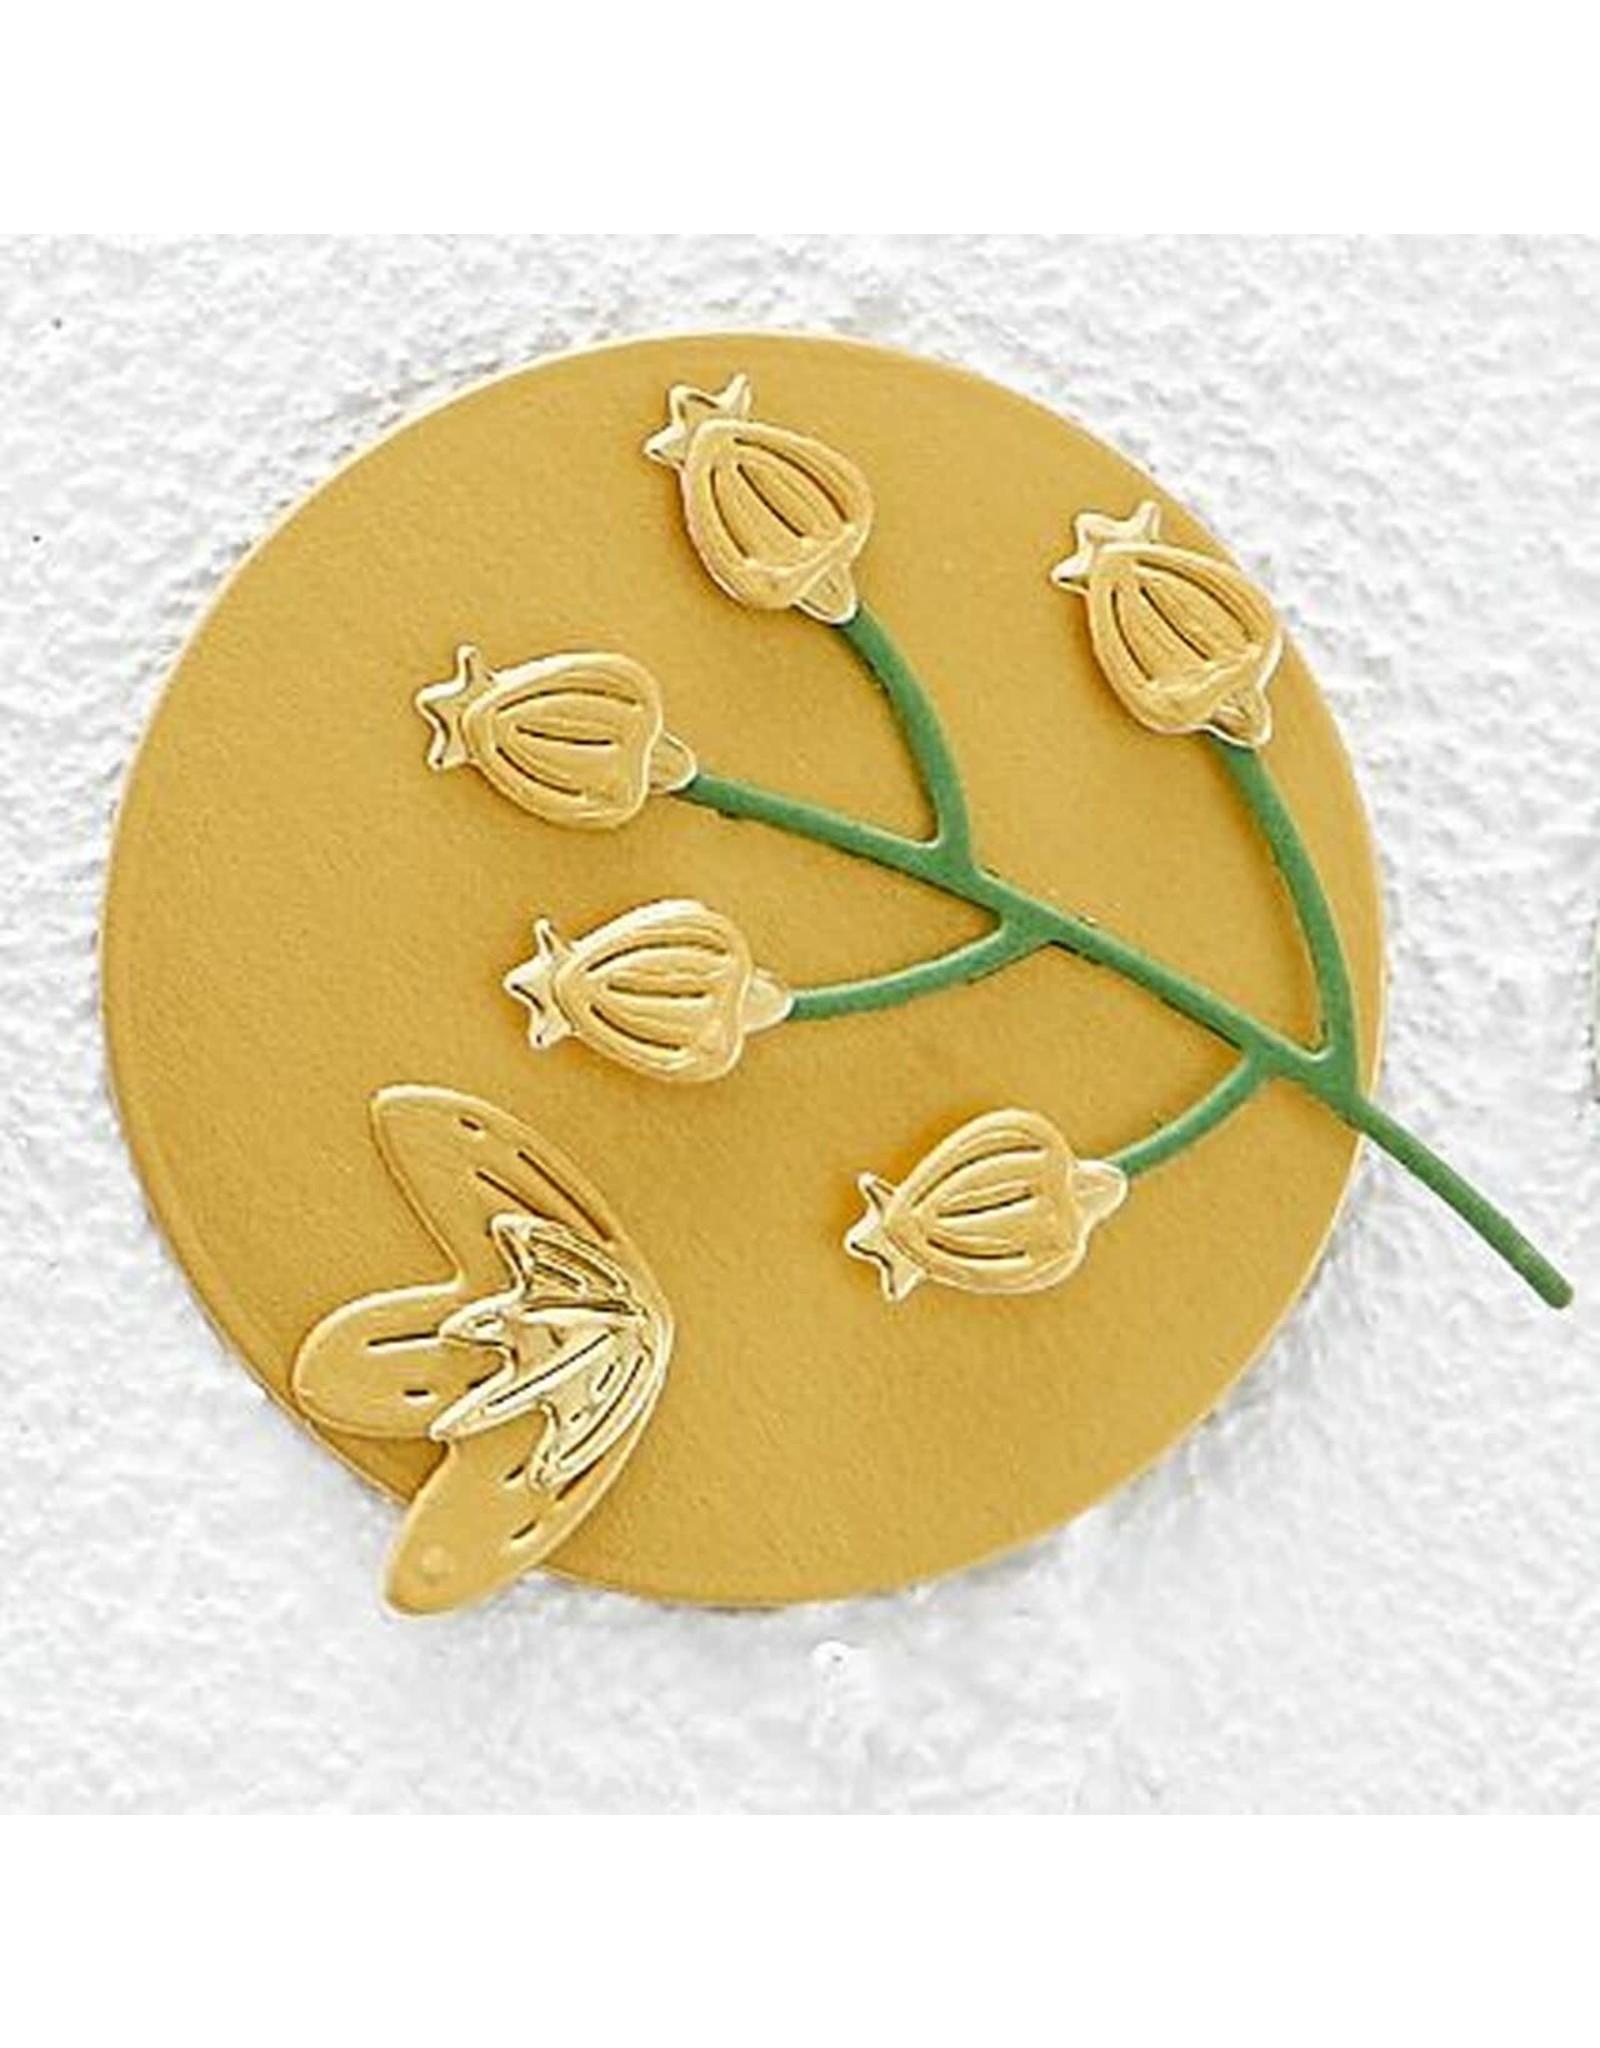 Spellbinders Brushed Gold Cardstock 8.5x11